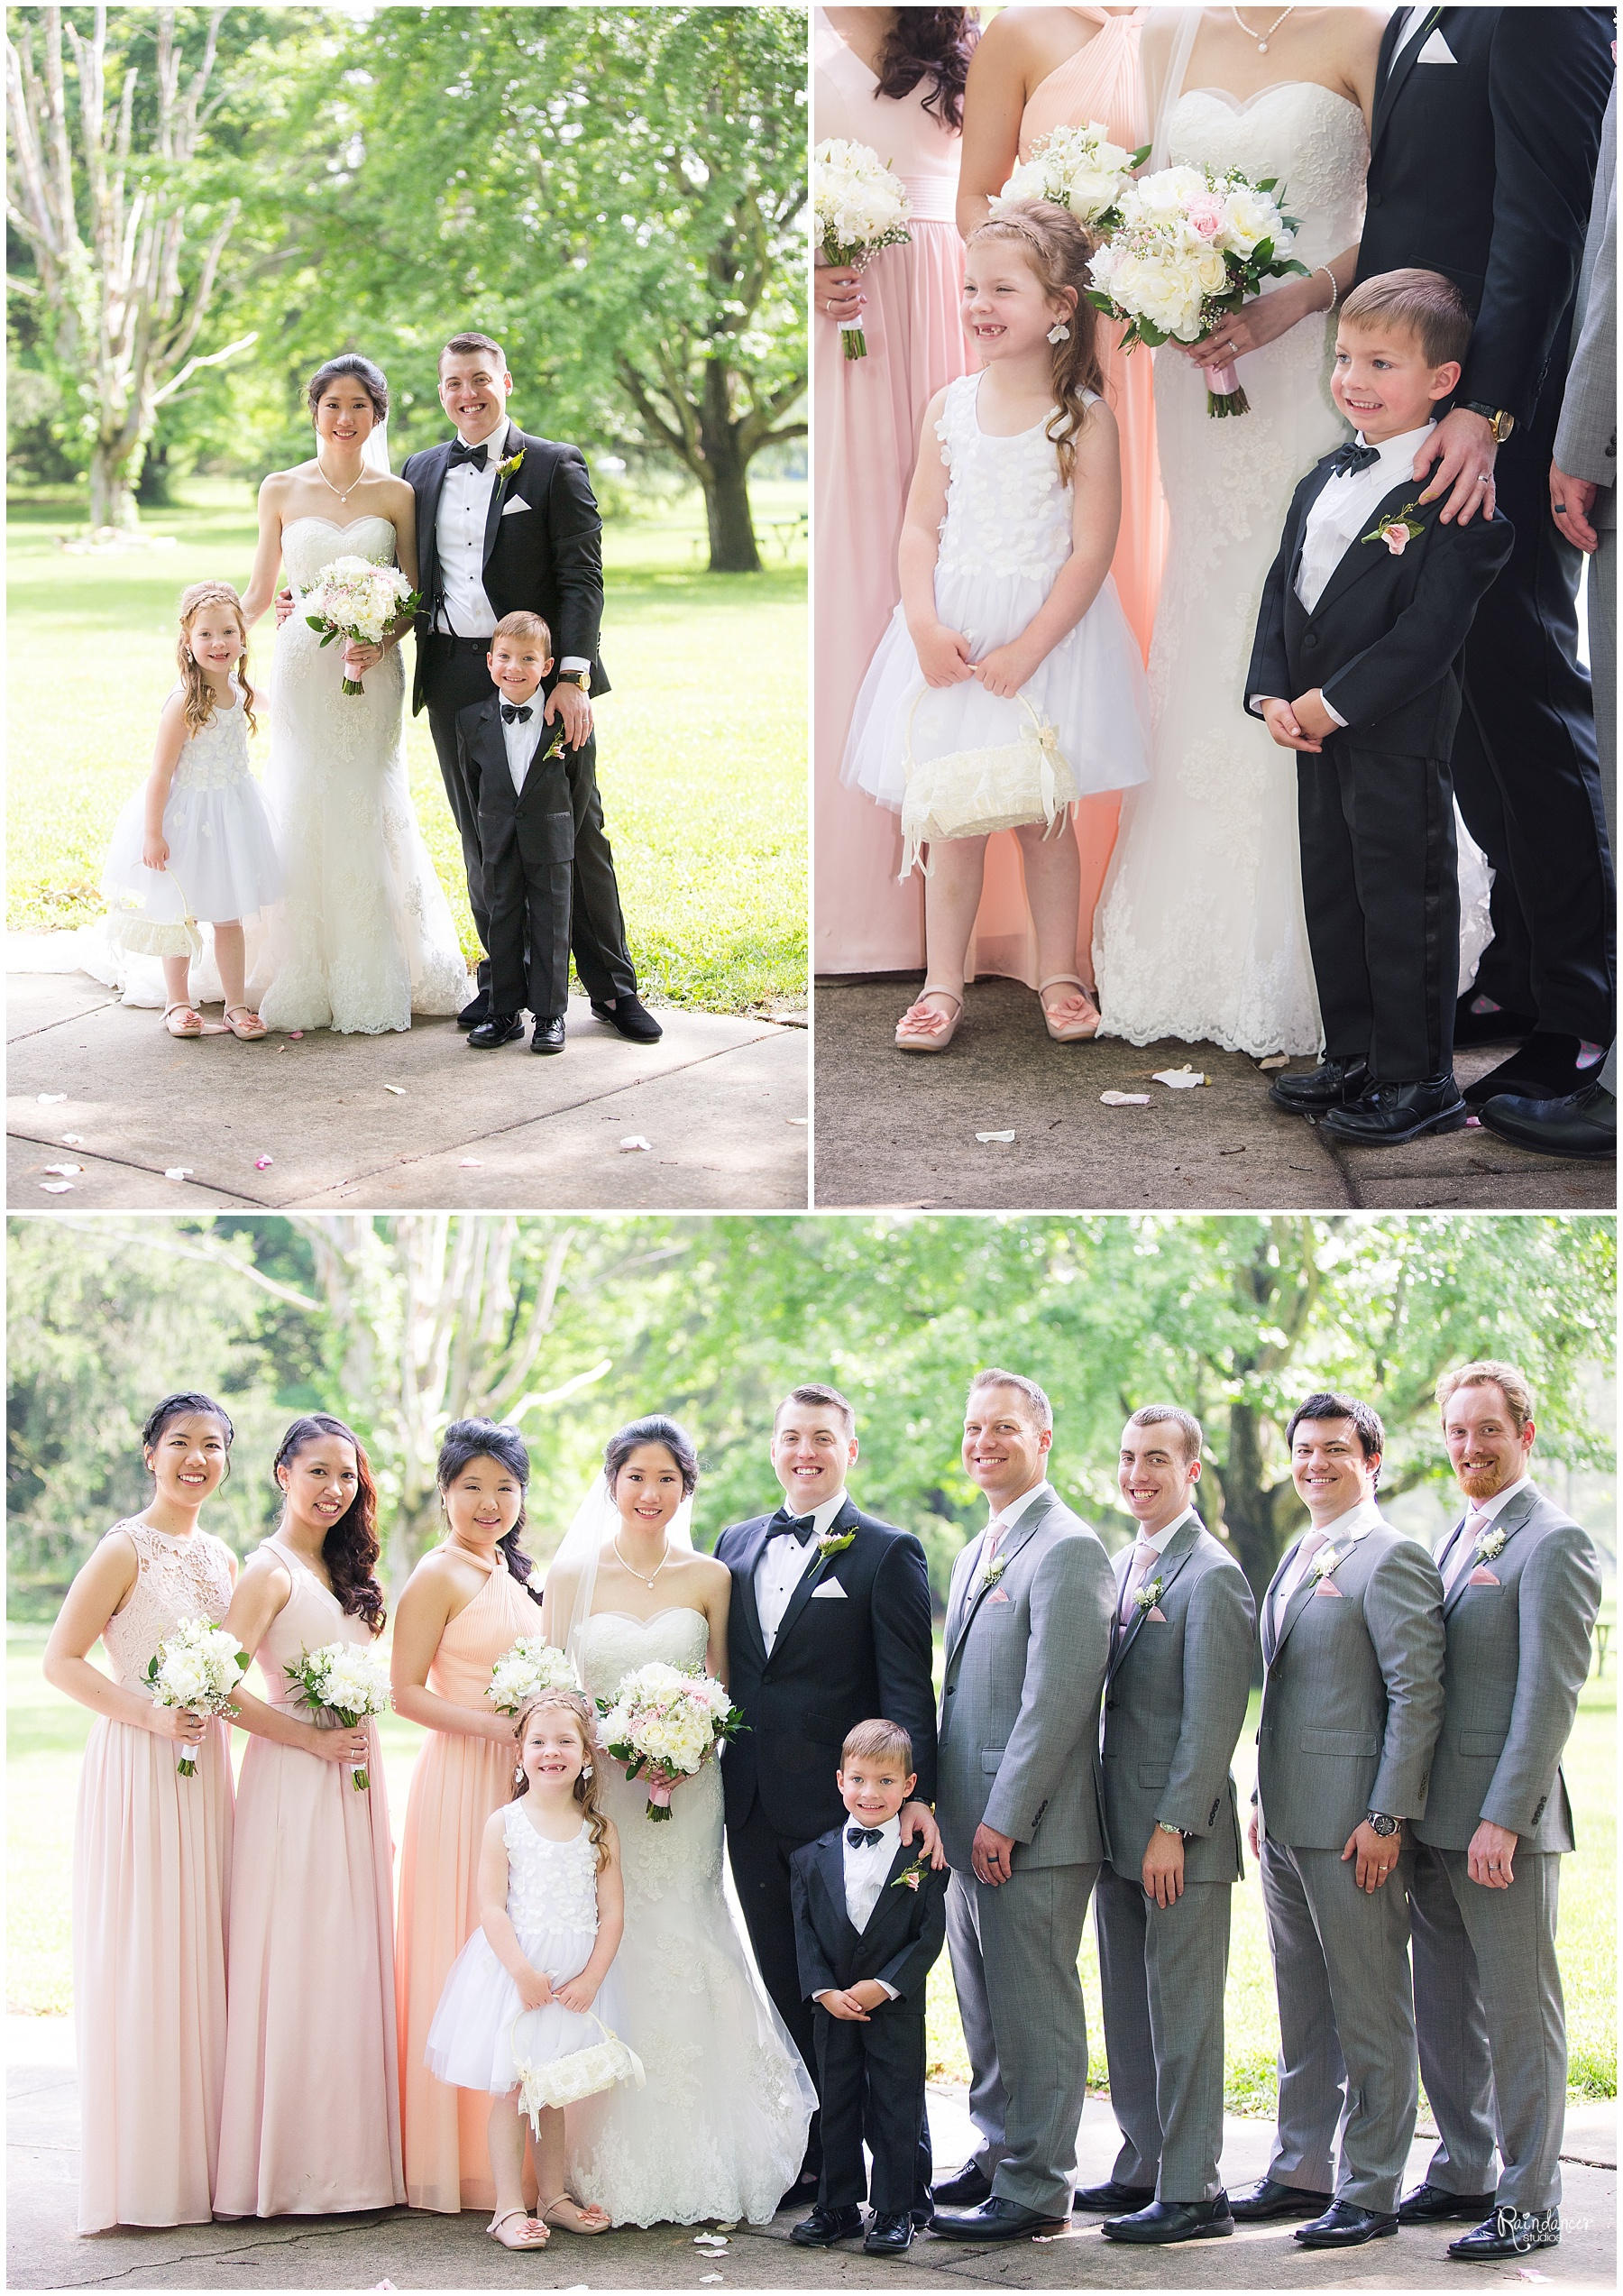 Indianapolis wedding photographer, Indianapolis wedding photography, Indy wedding photographer, Indy wedding photography, midwest wedding photographer, Indiana wedding photographer, Indiana wedding photography